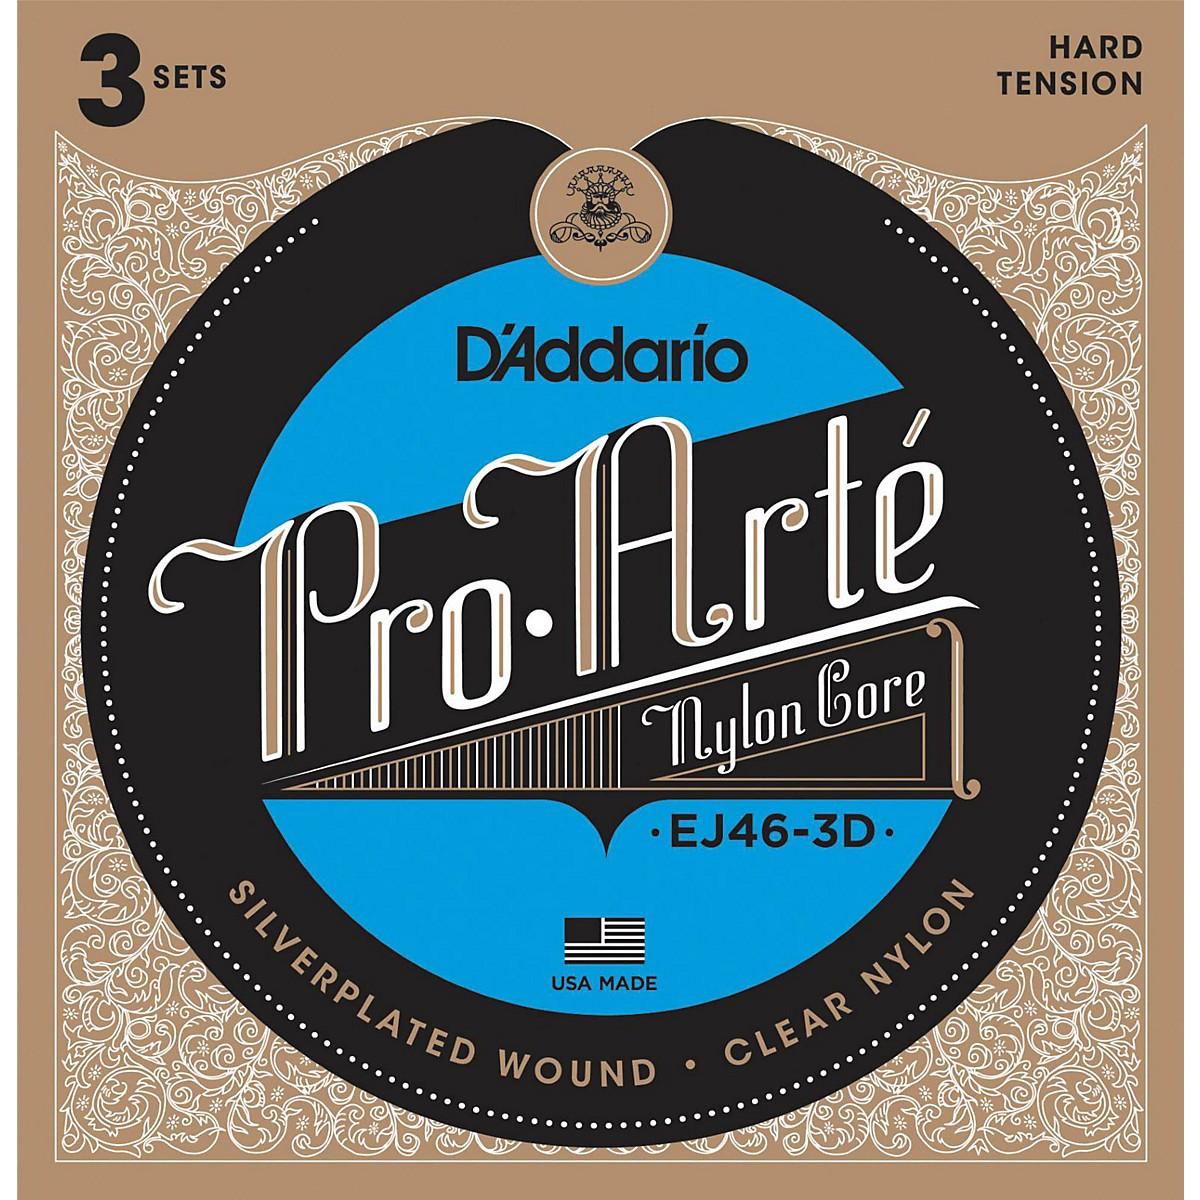 D'Addario EJ46 Pro-Arte Classical Guitar Strings 3-Pack